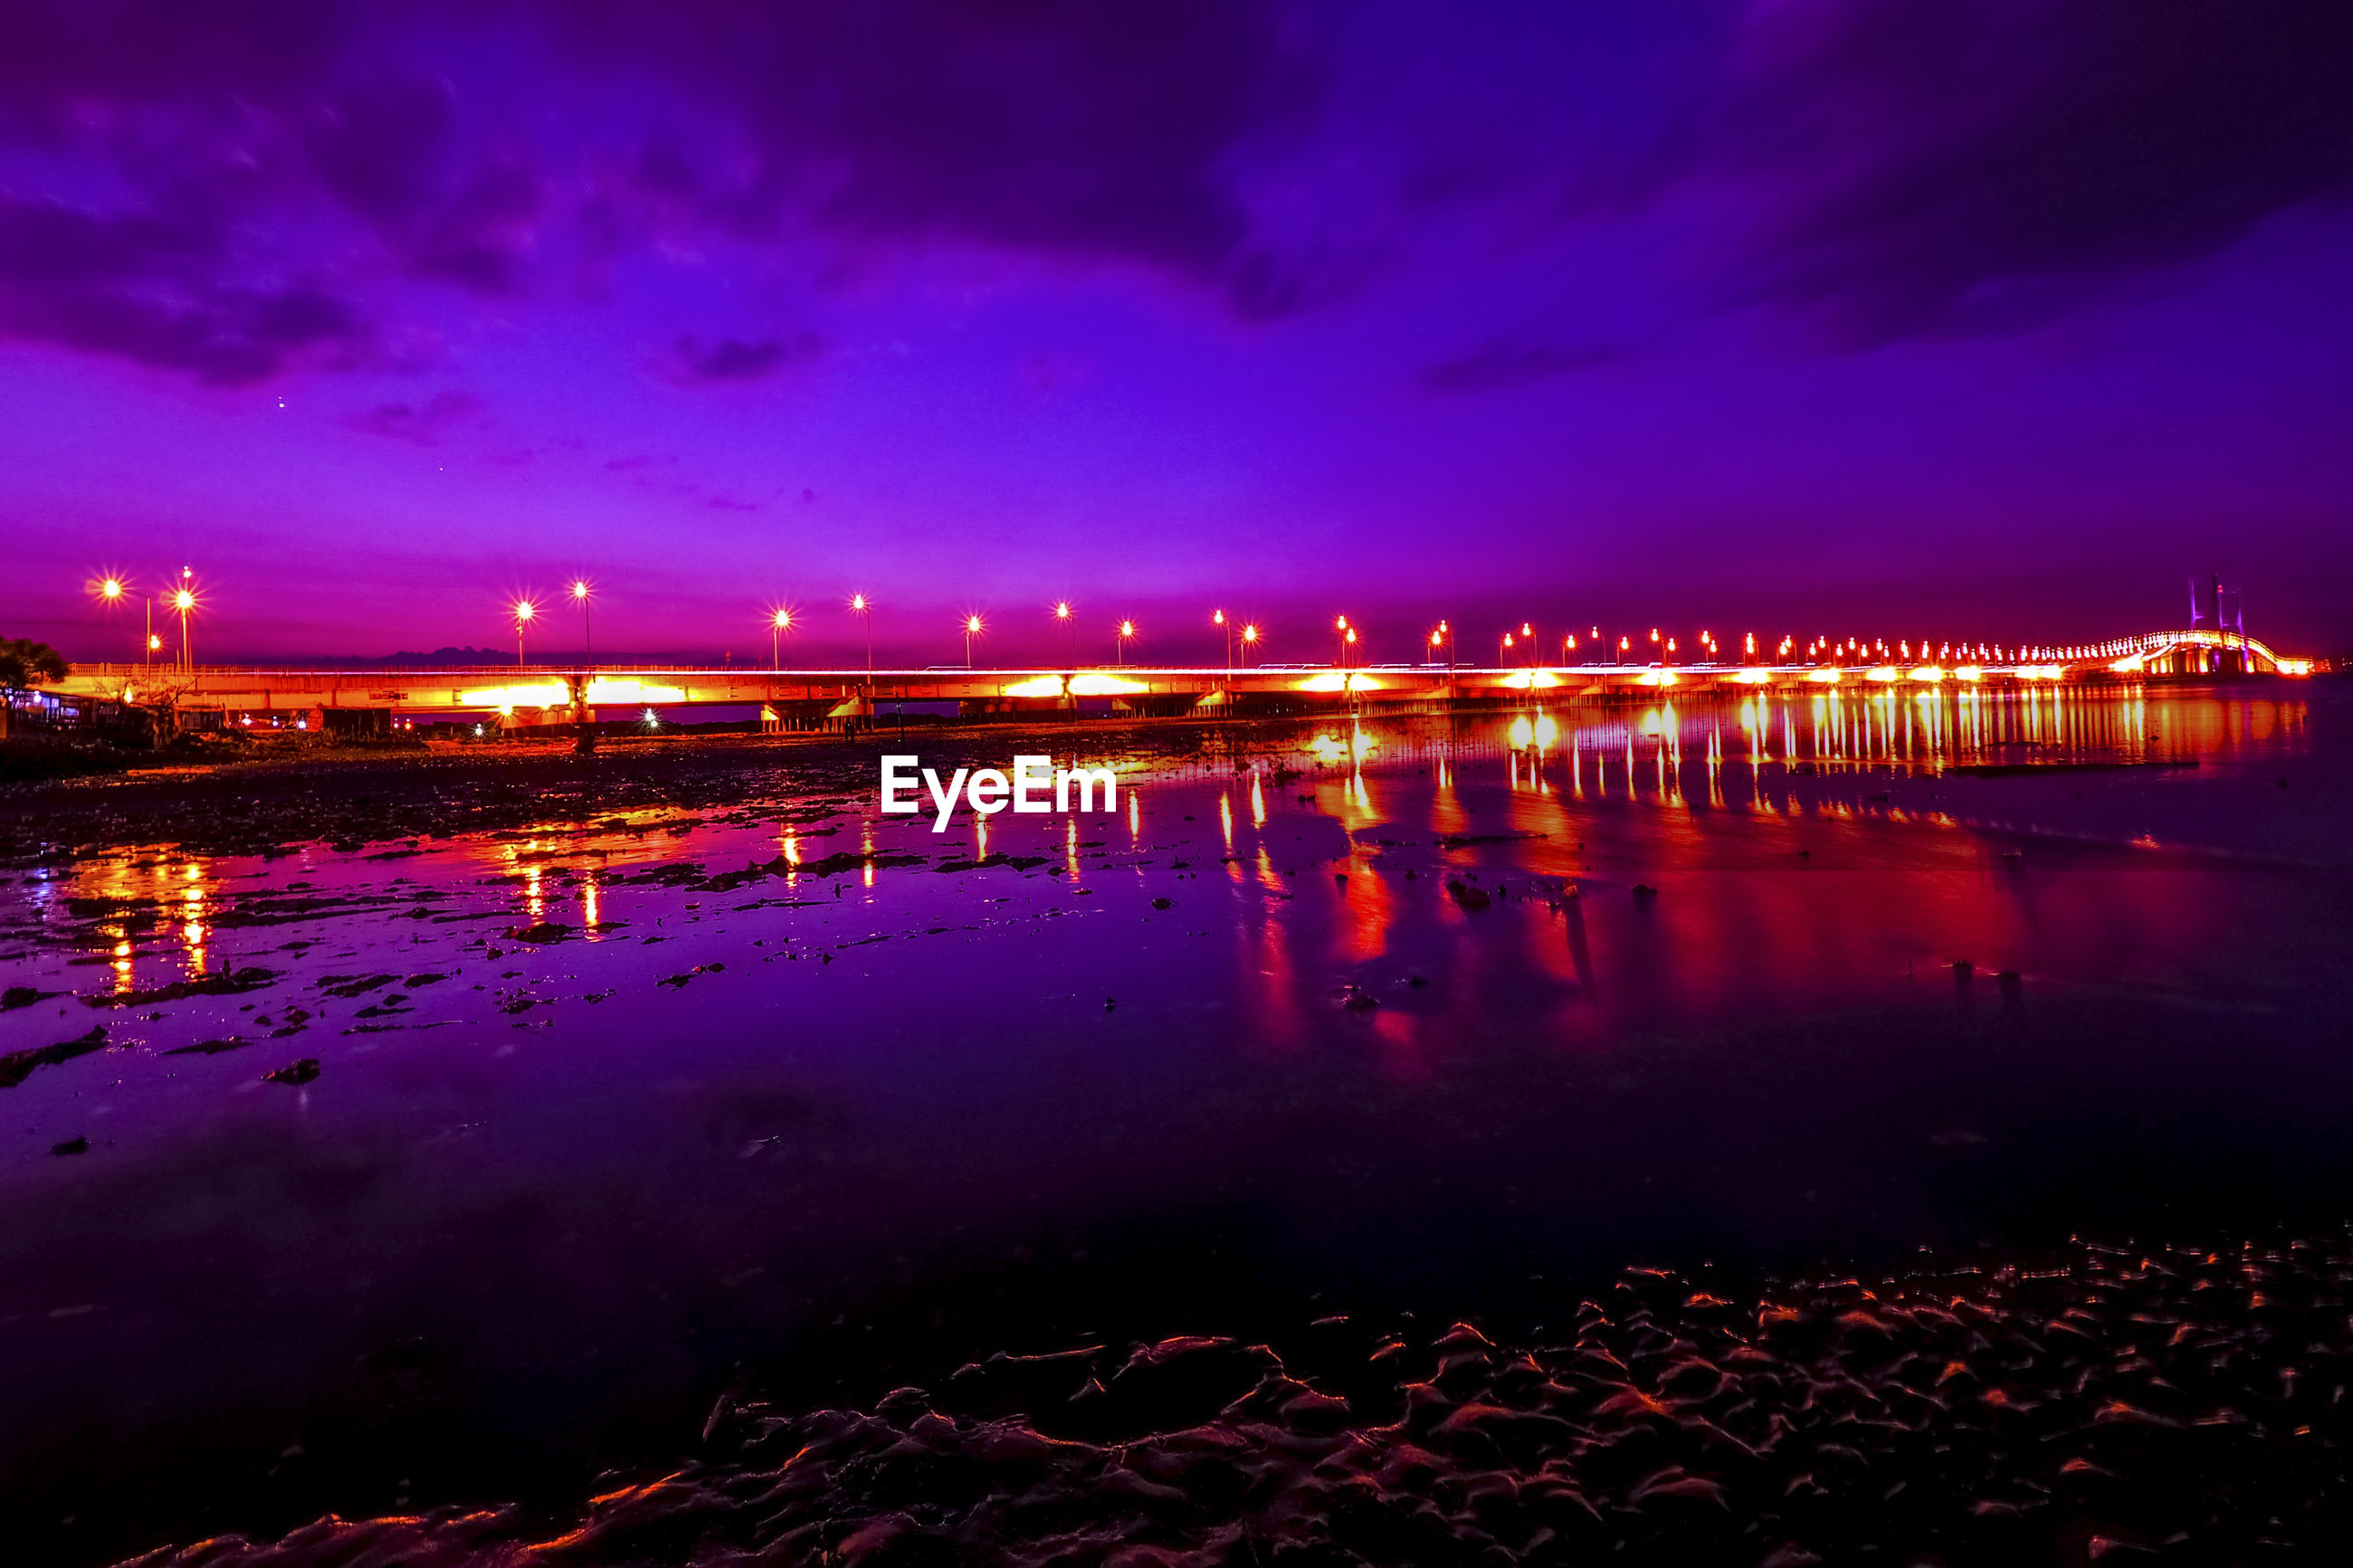 SCENIC VIEW OF ILLUMINATED LIGHTS AT NIGHT